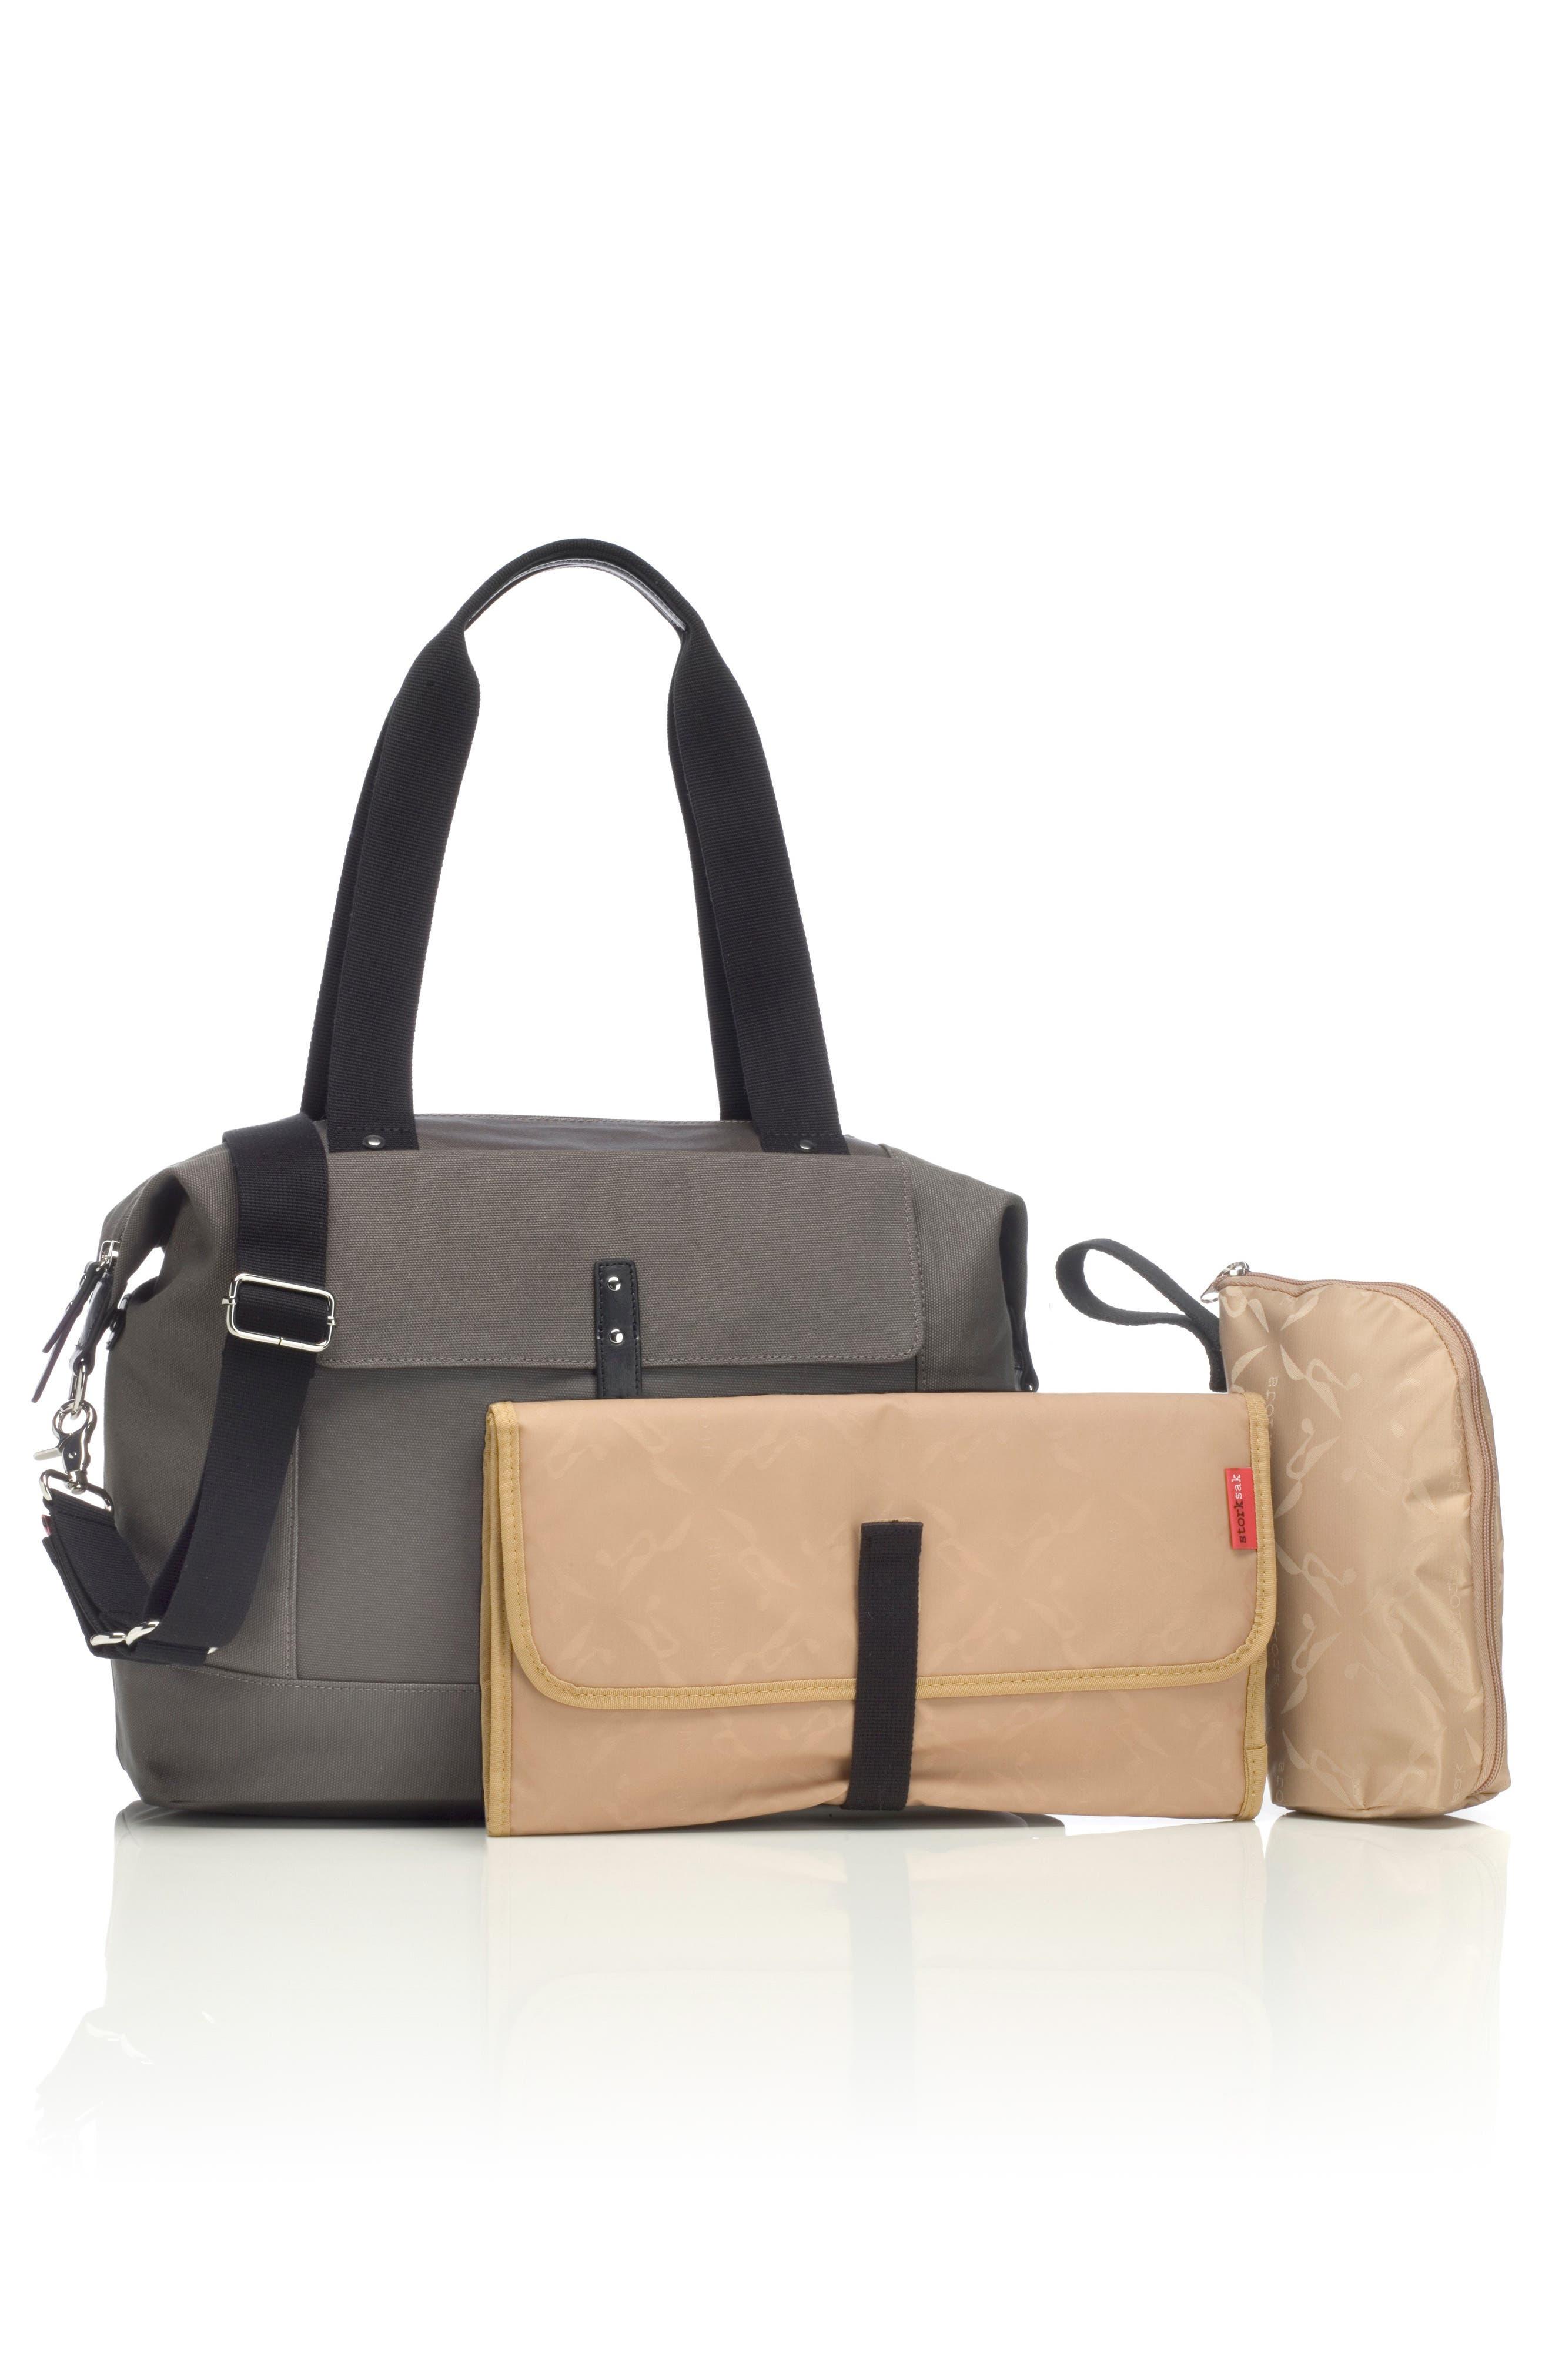 03e2383a6803 Storksak Diaper   Baby Bags